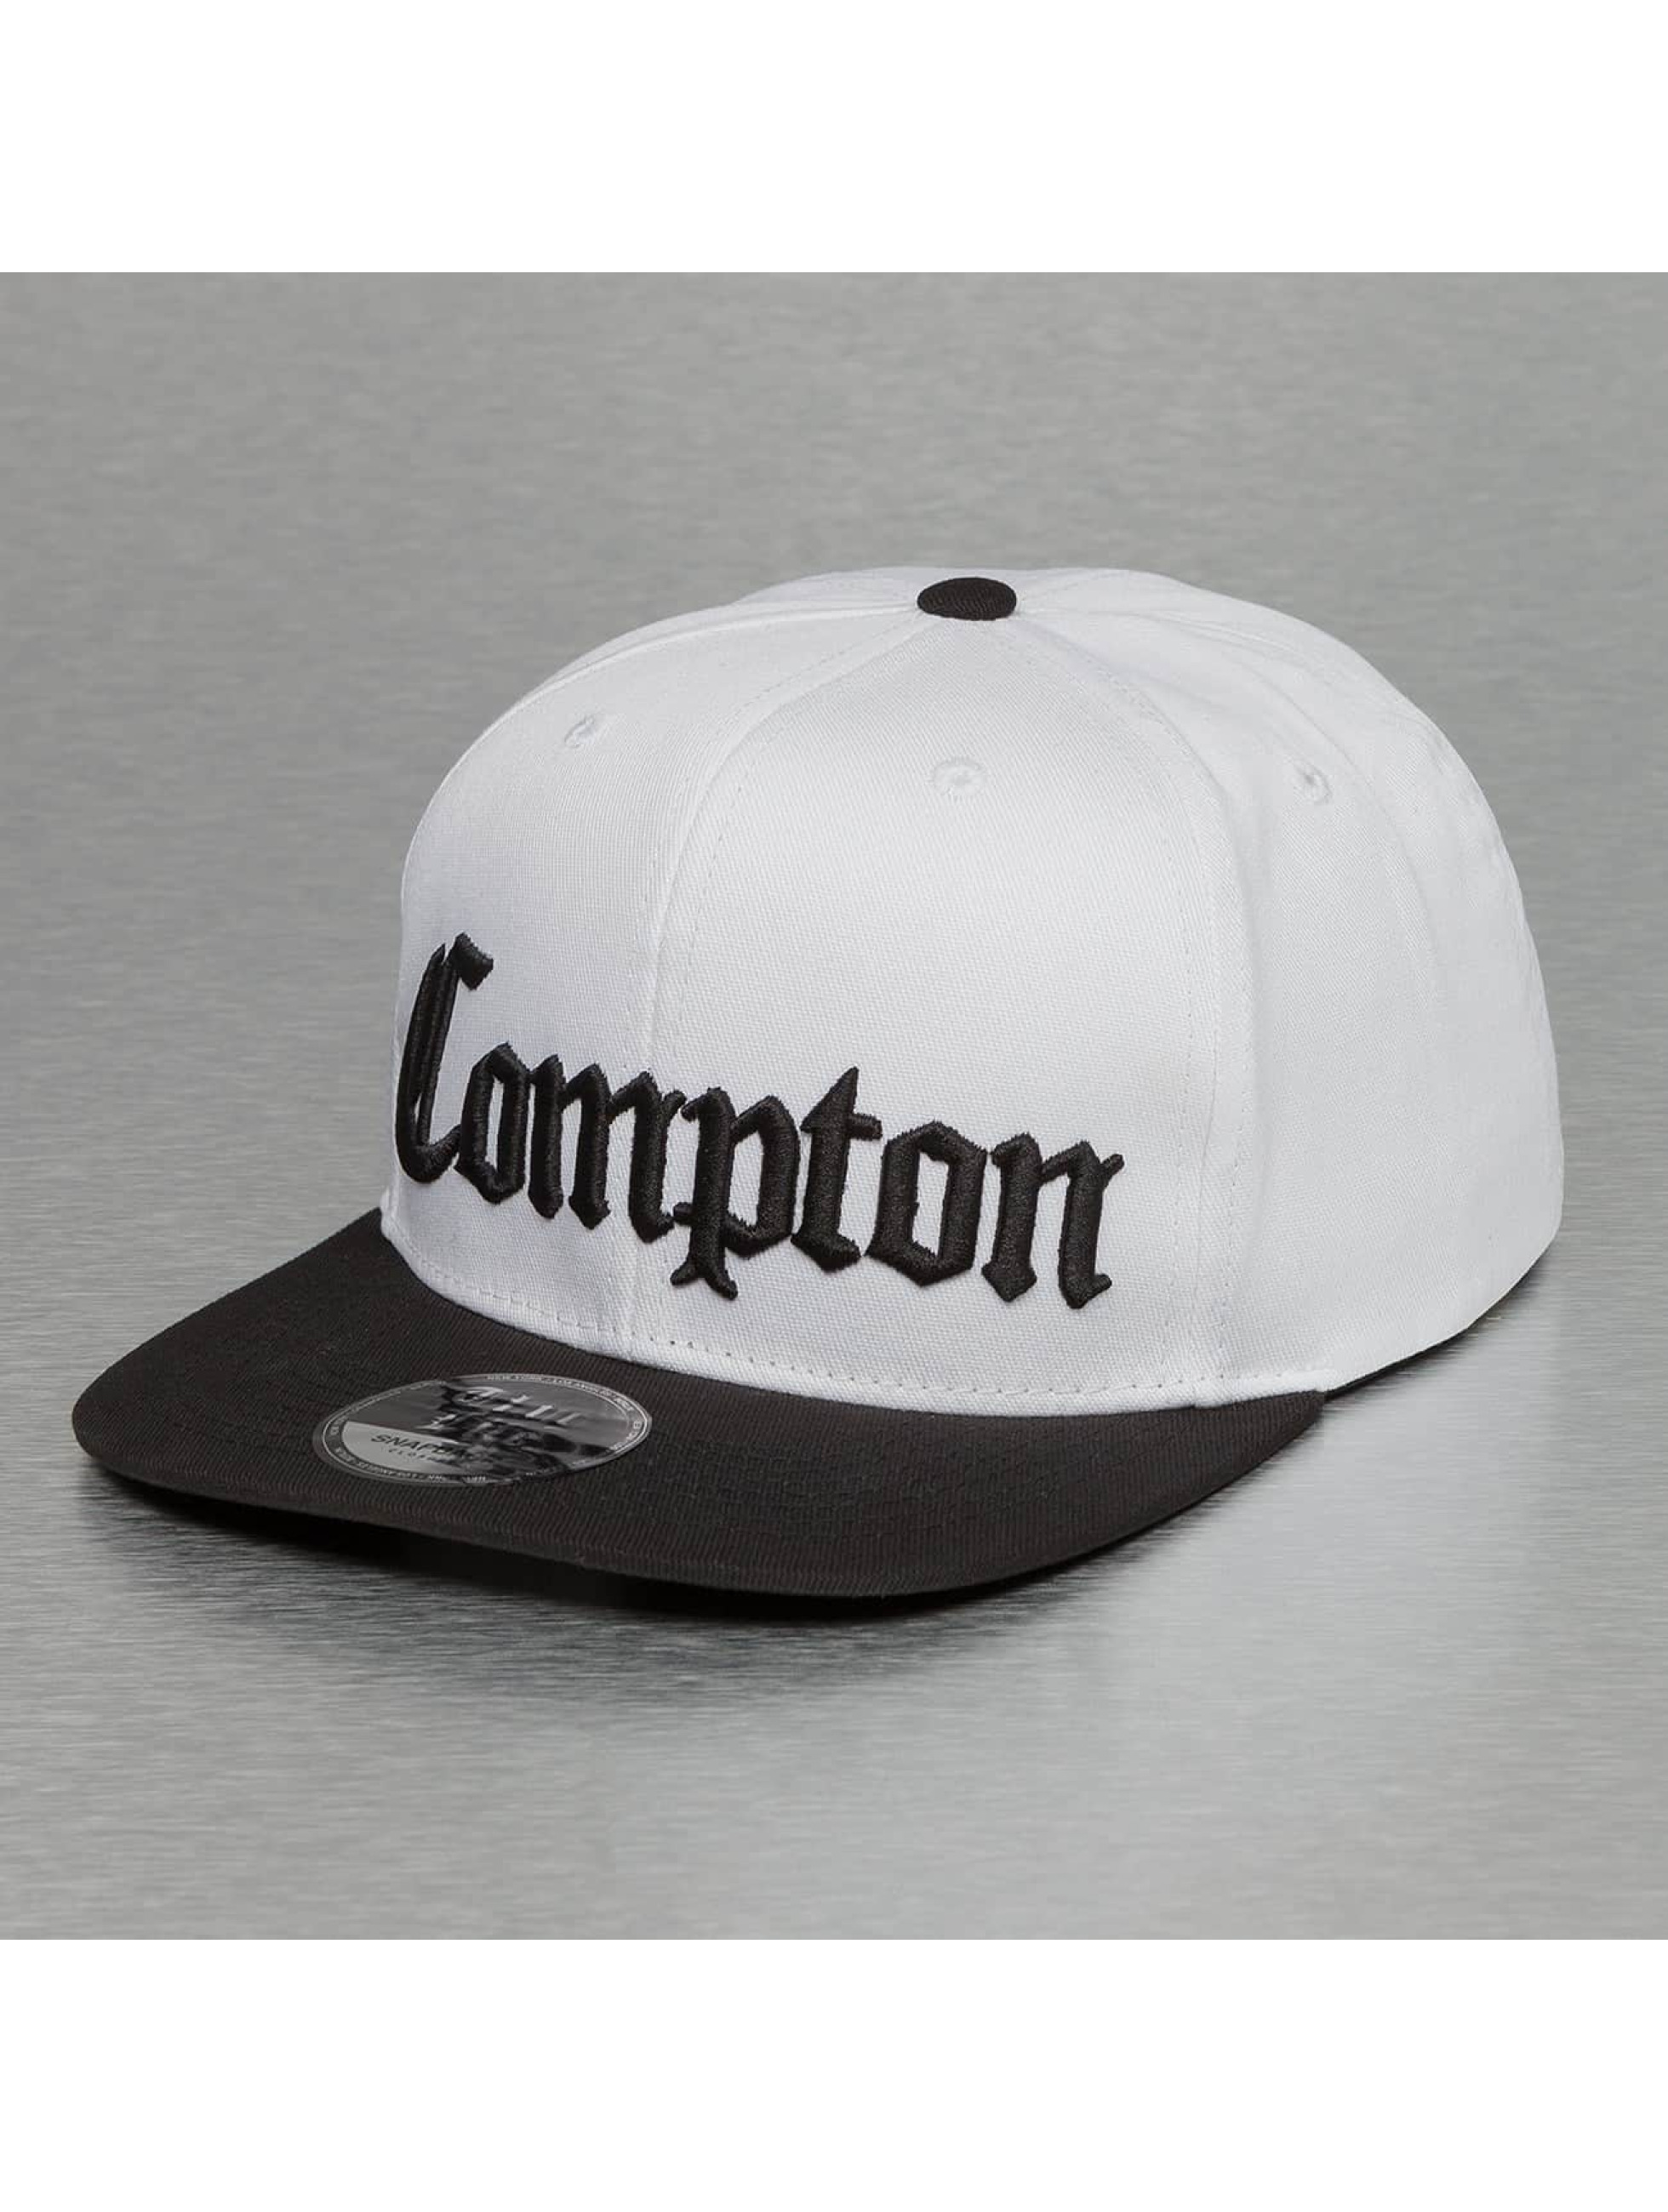 Thug Life Snapback Caps Compton valkoinen